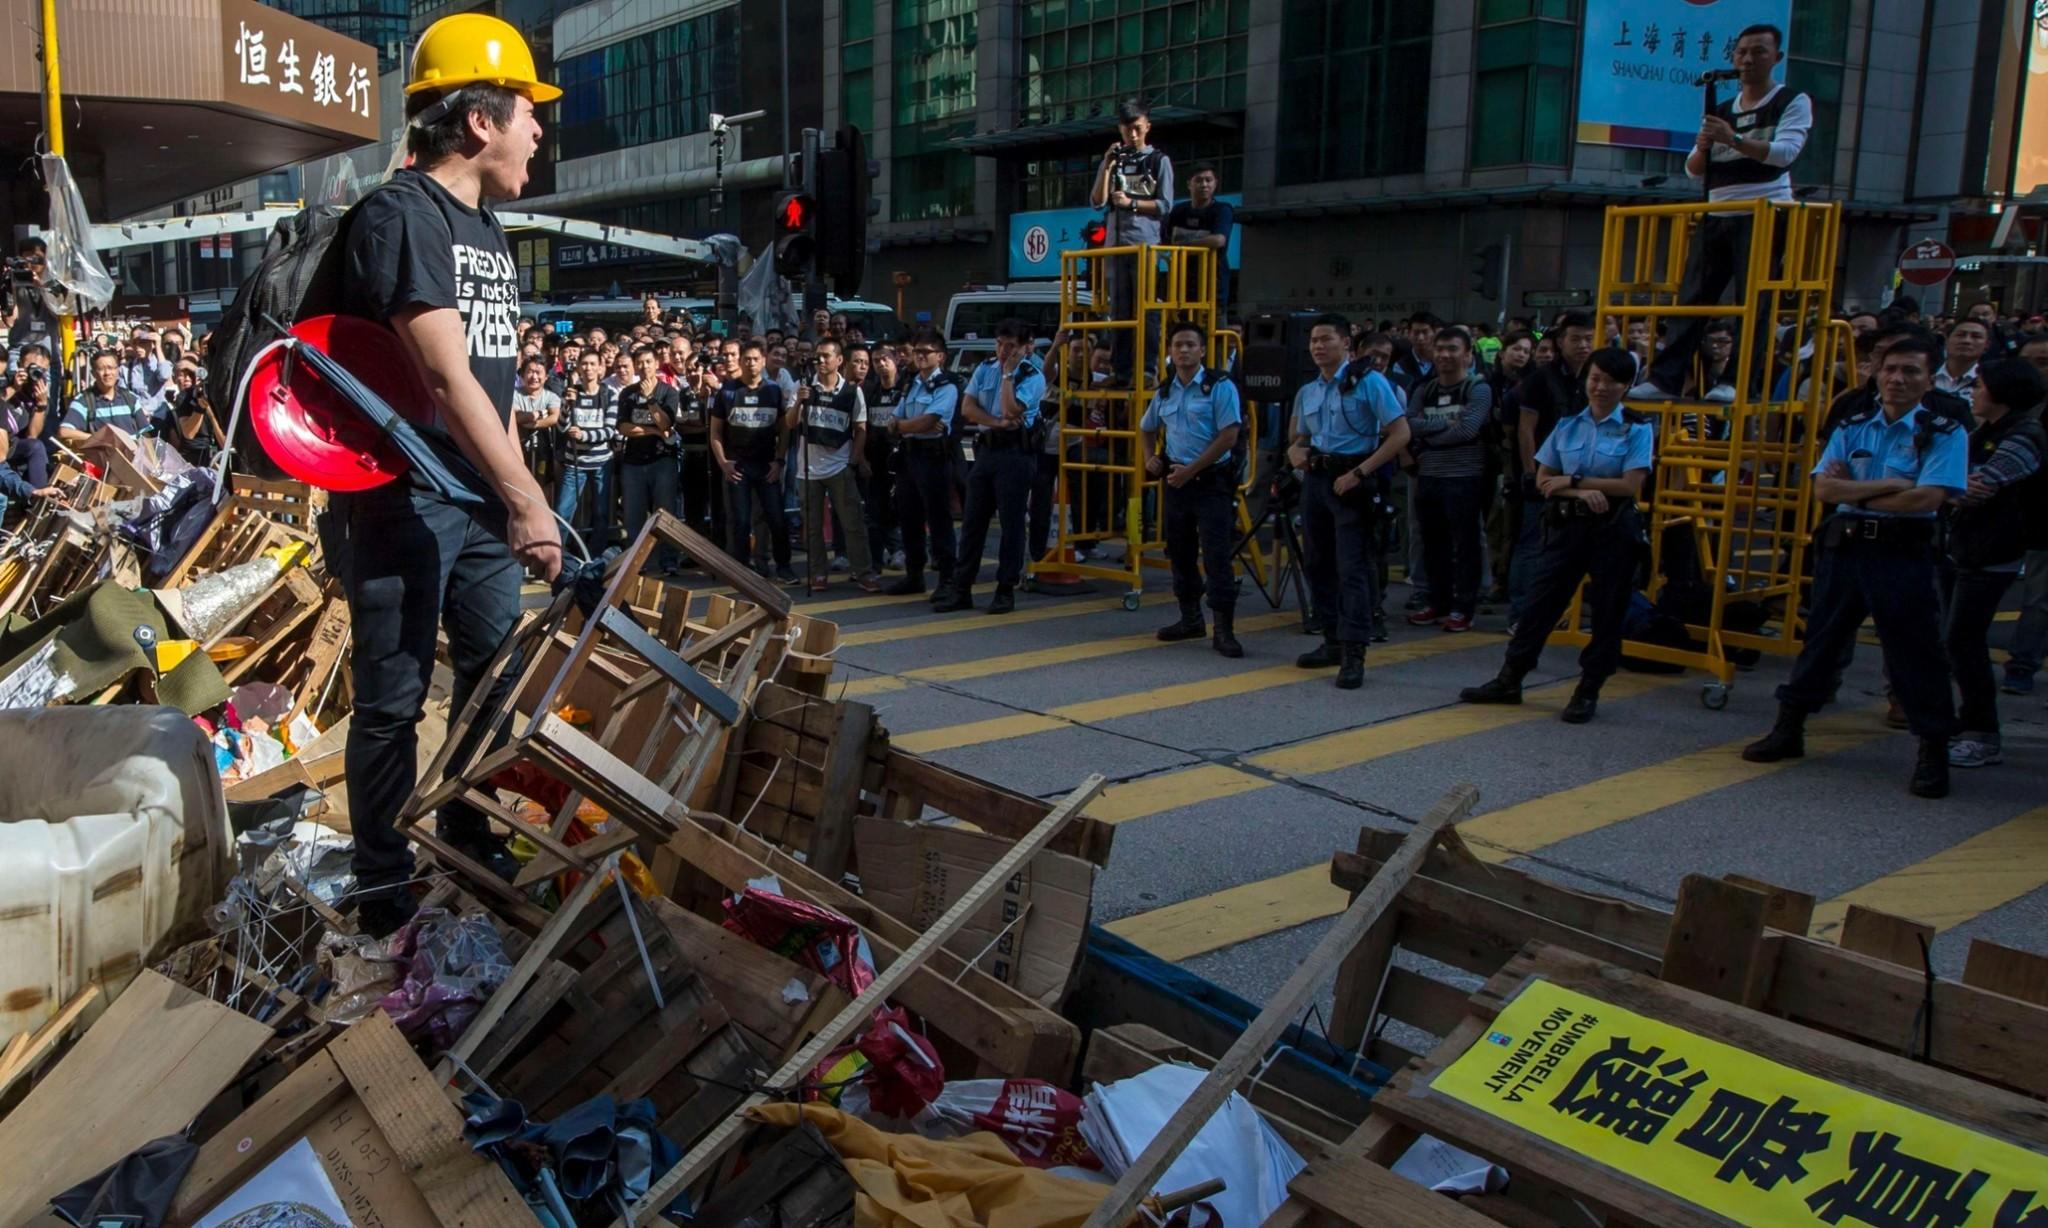 Hong Kong police begin dismantling Mong Kok protest site